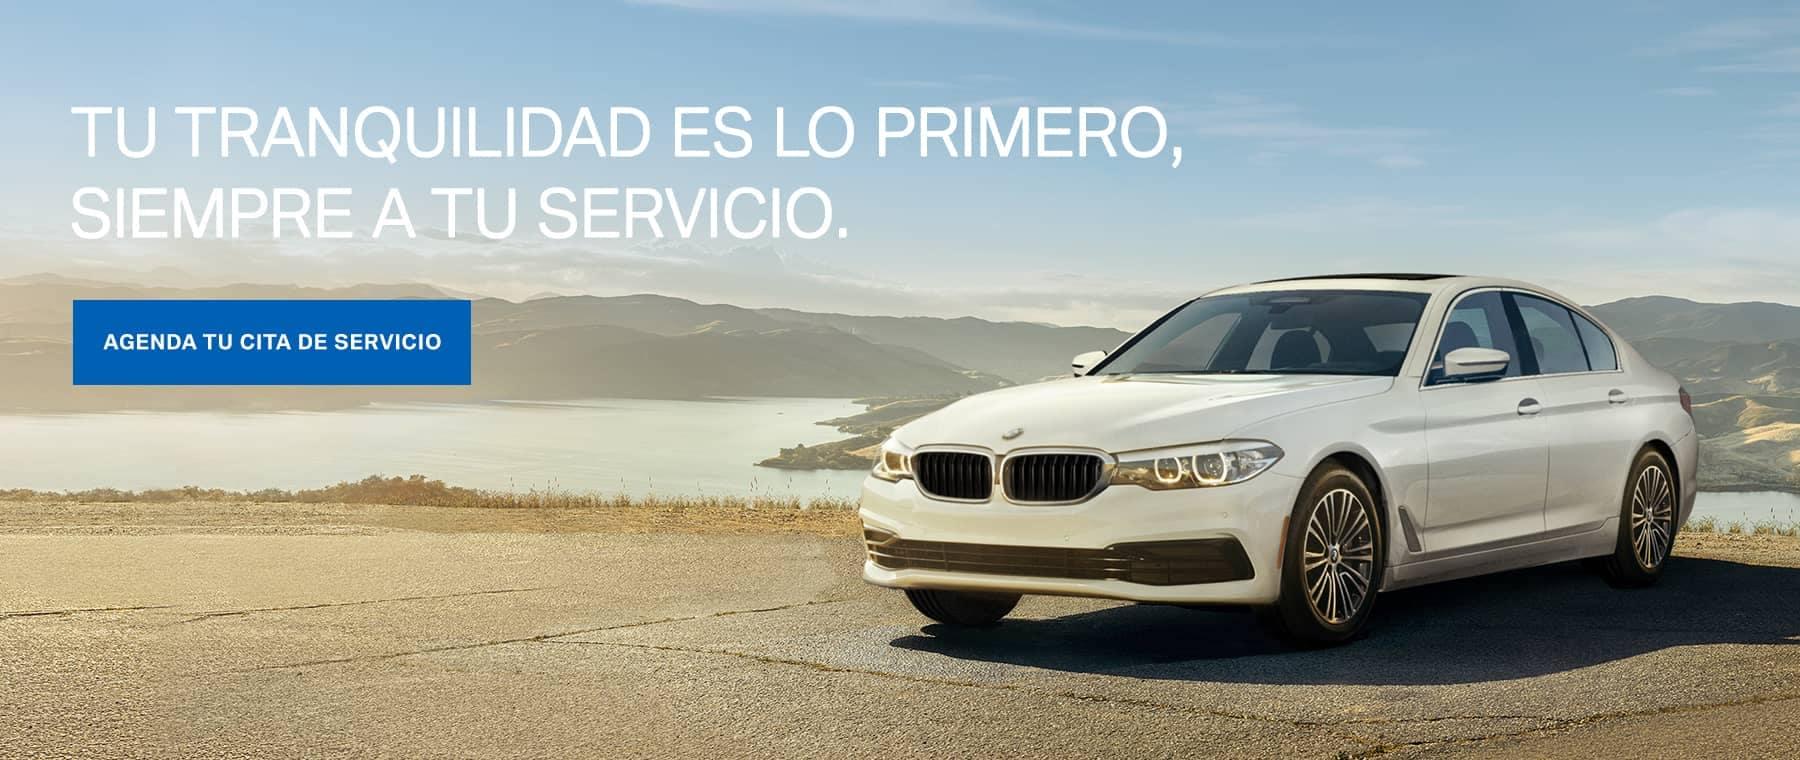 Service Banner Spanish